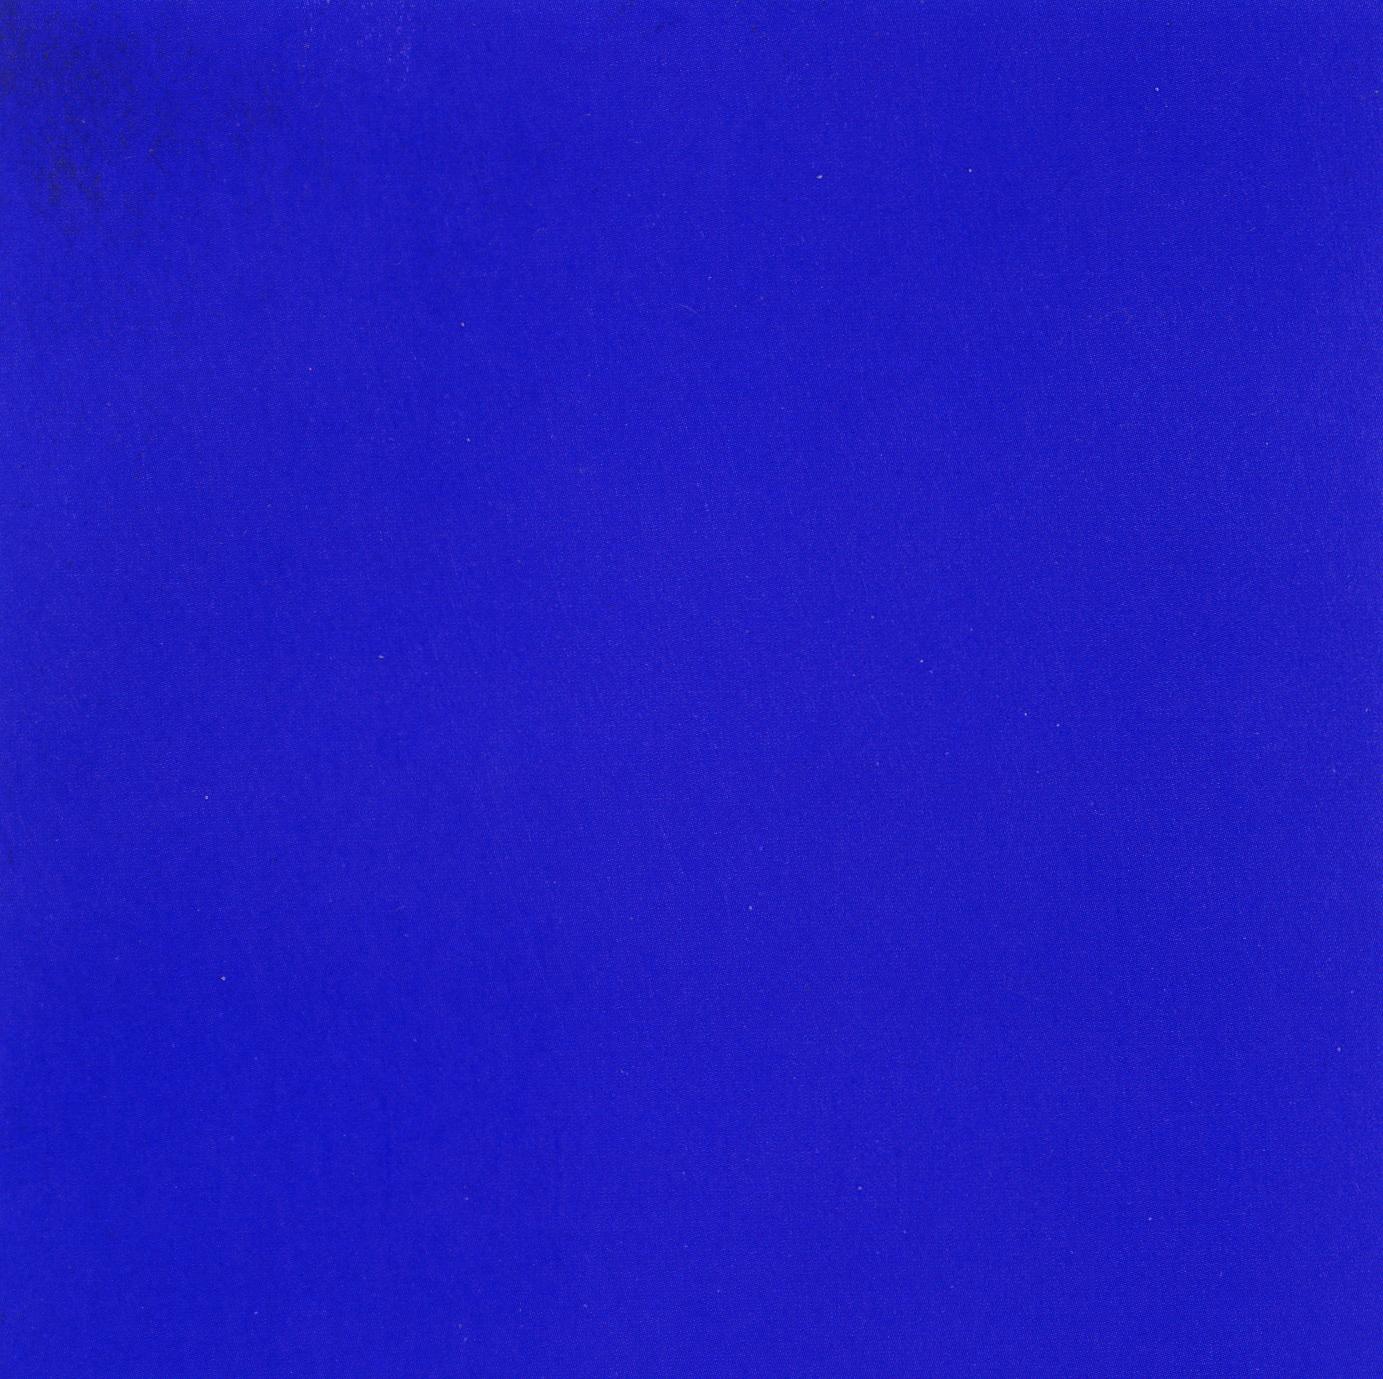 db9d7e53a4fd81b1240375fb6b0b4f28_Bleu-Original.jpeg